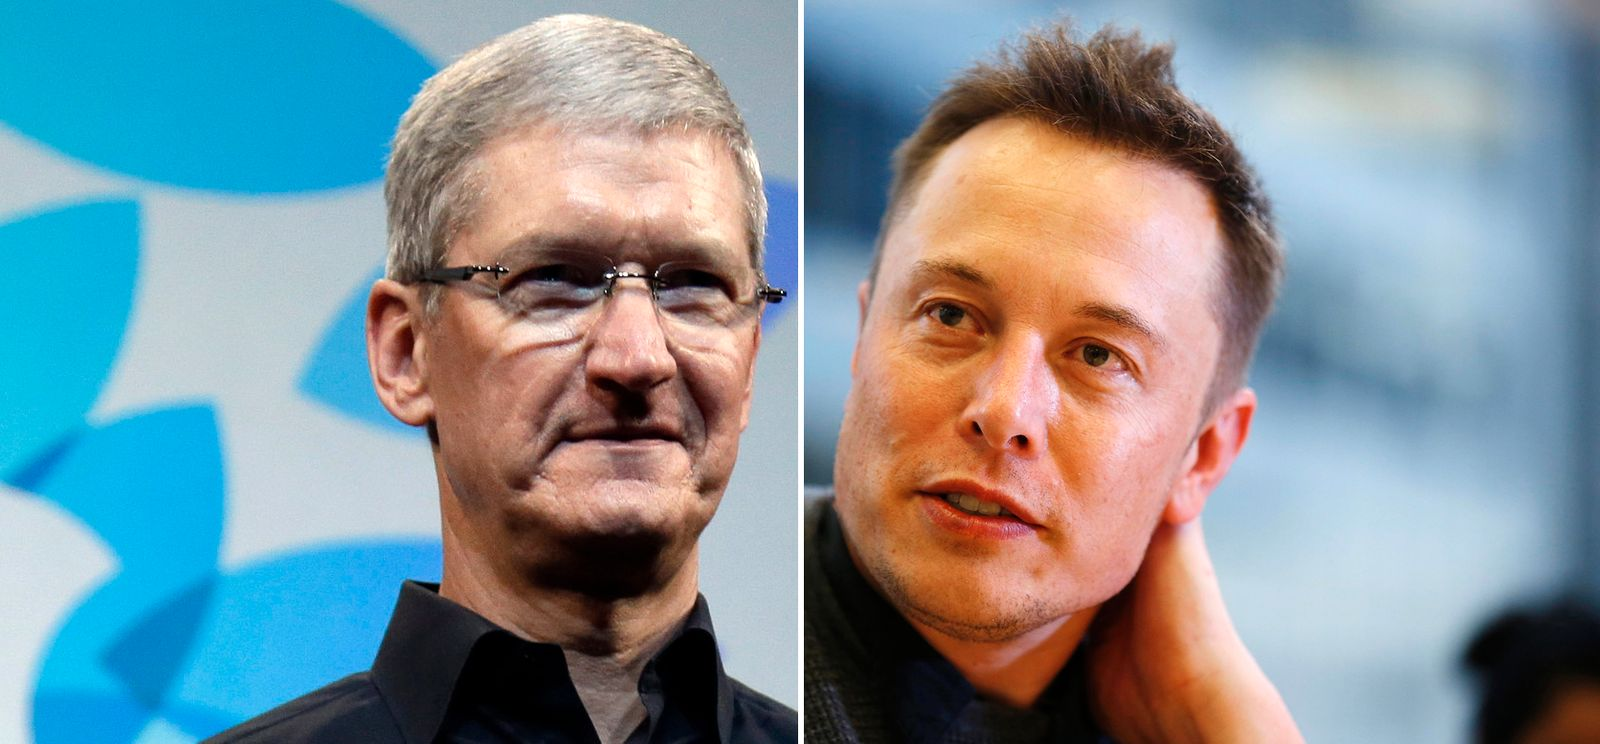 KOMBO Tim Cook / Elon Musk